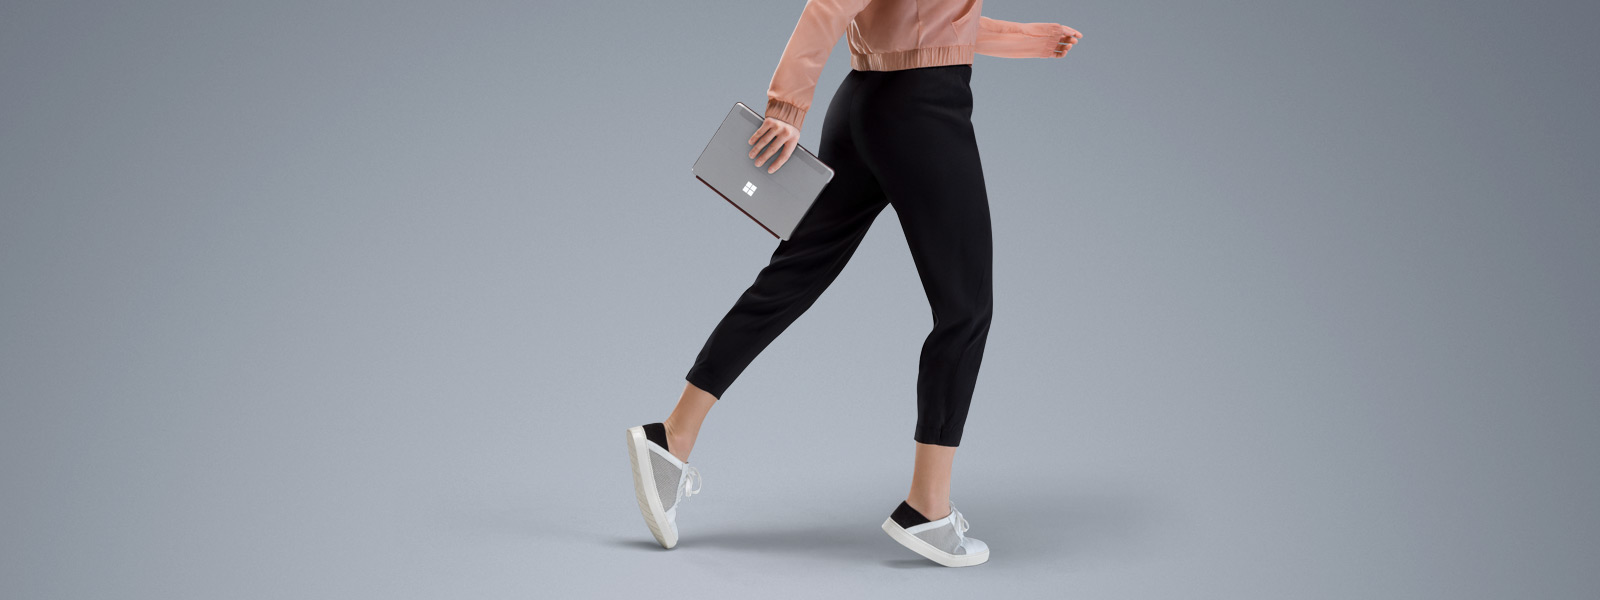 女孩拿著 Surface Go 走路